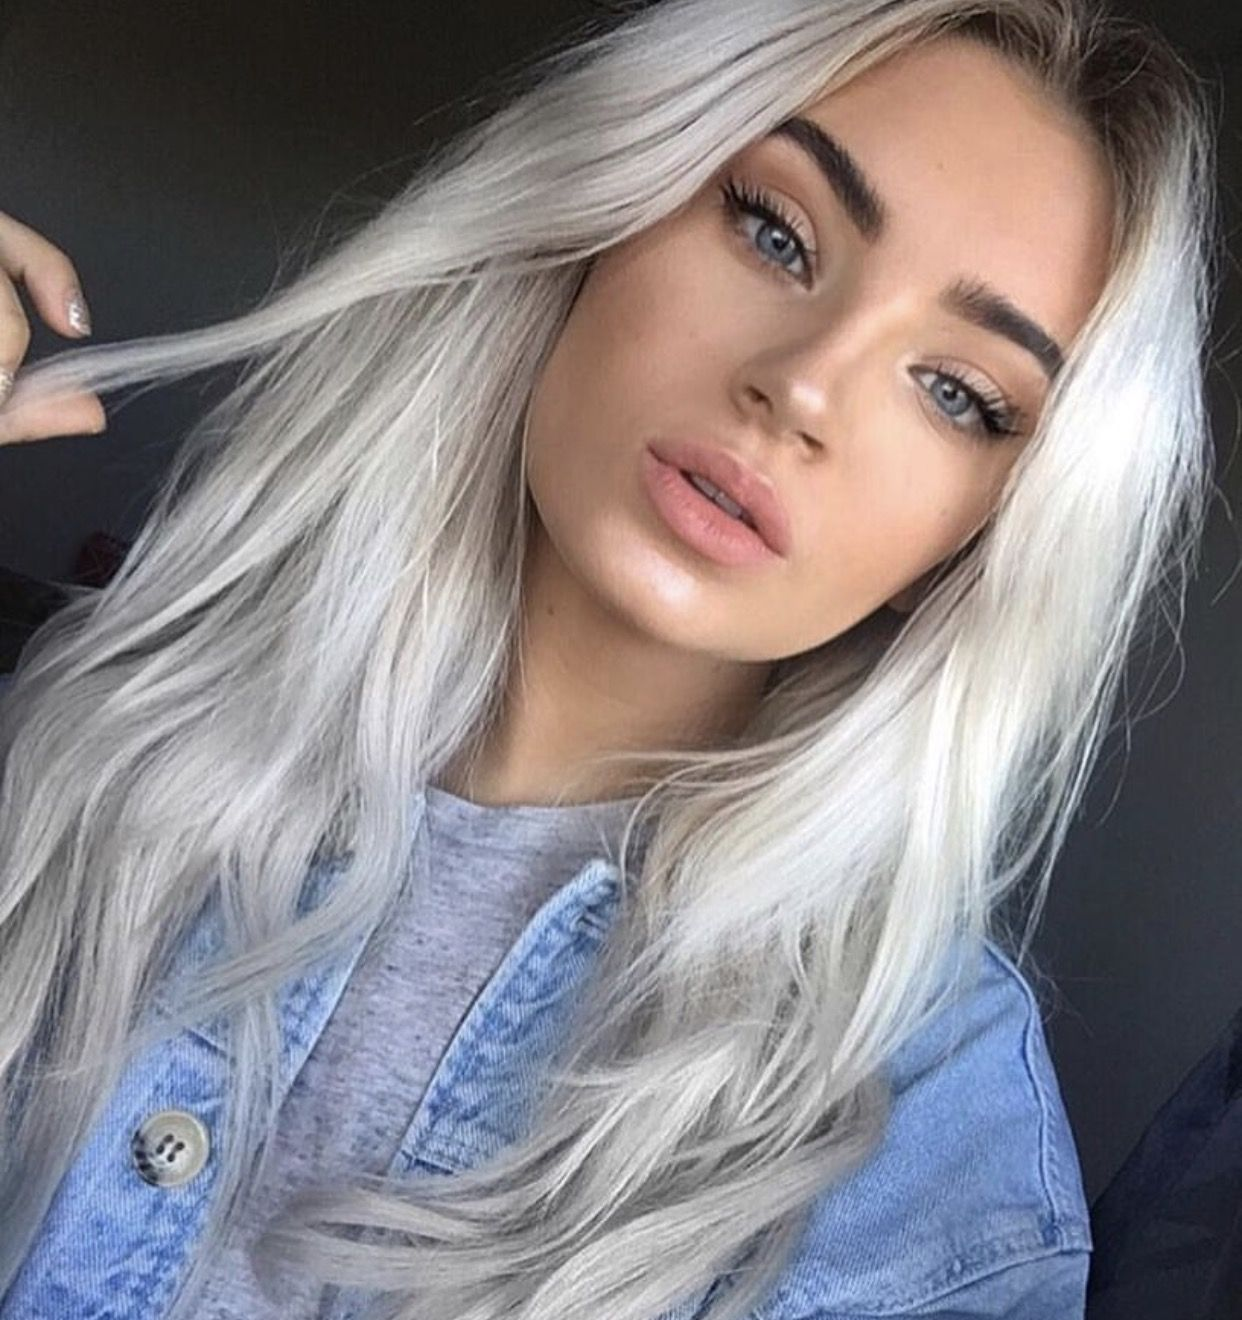 Brxkenscenes Hair Pale Skin Silver Blonde Hair Platinum Blonde Hair